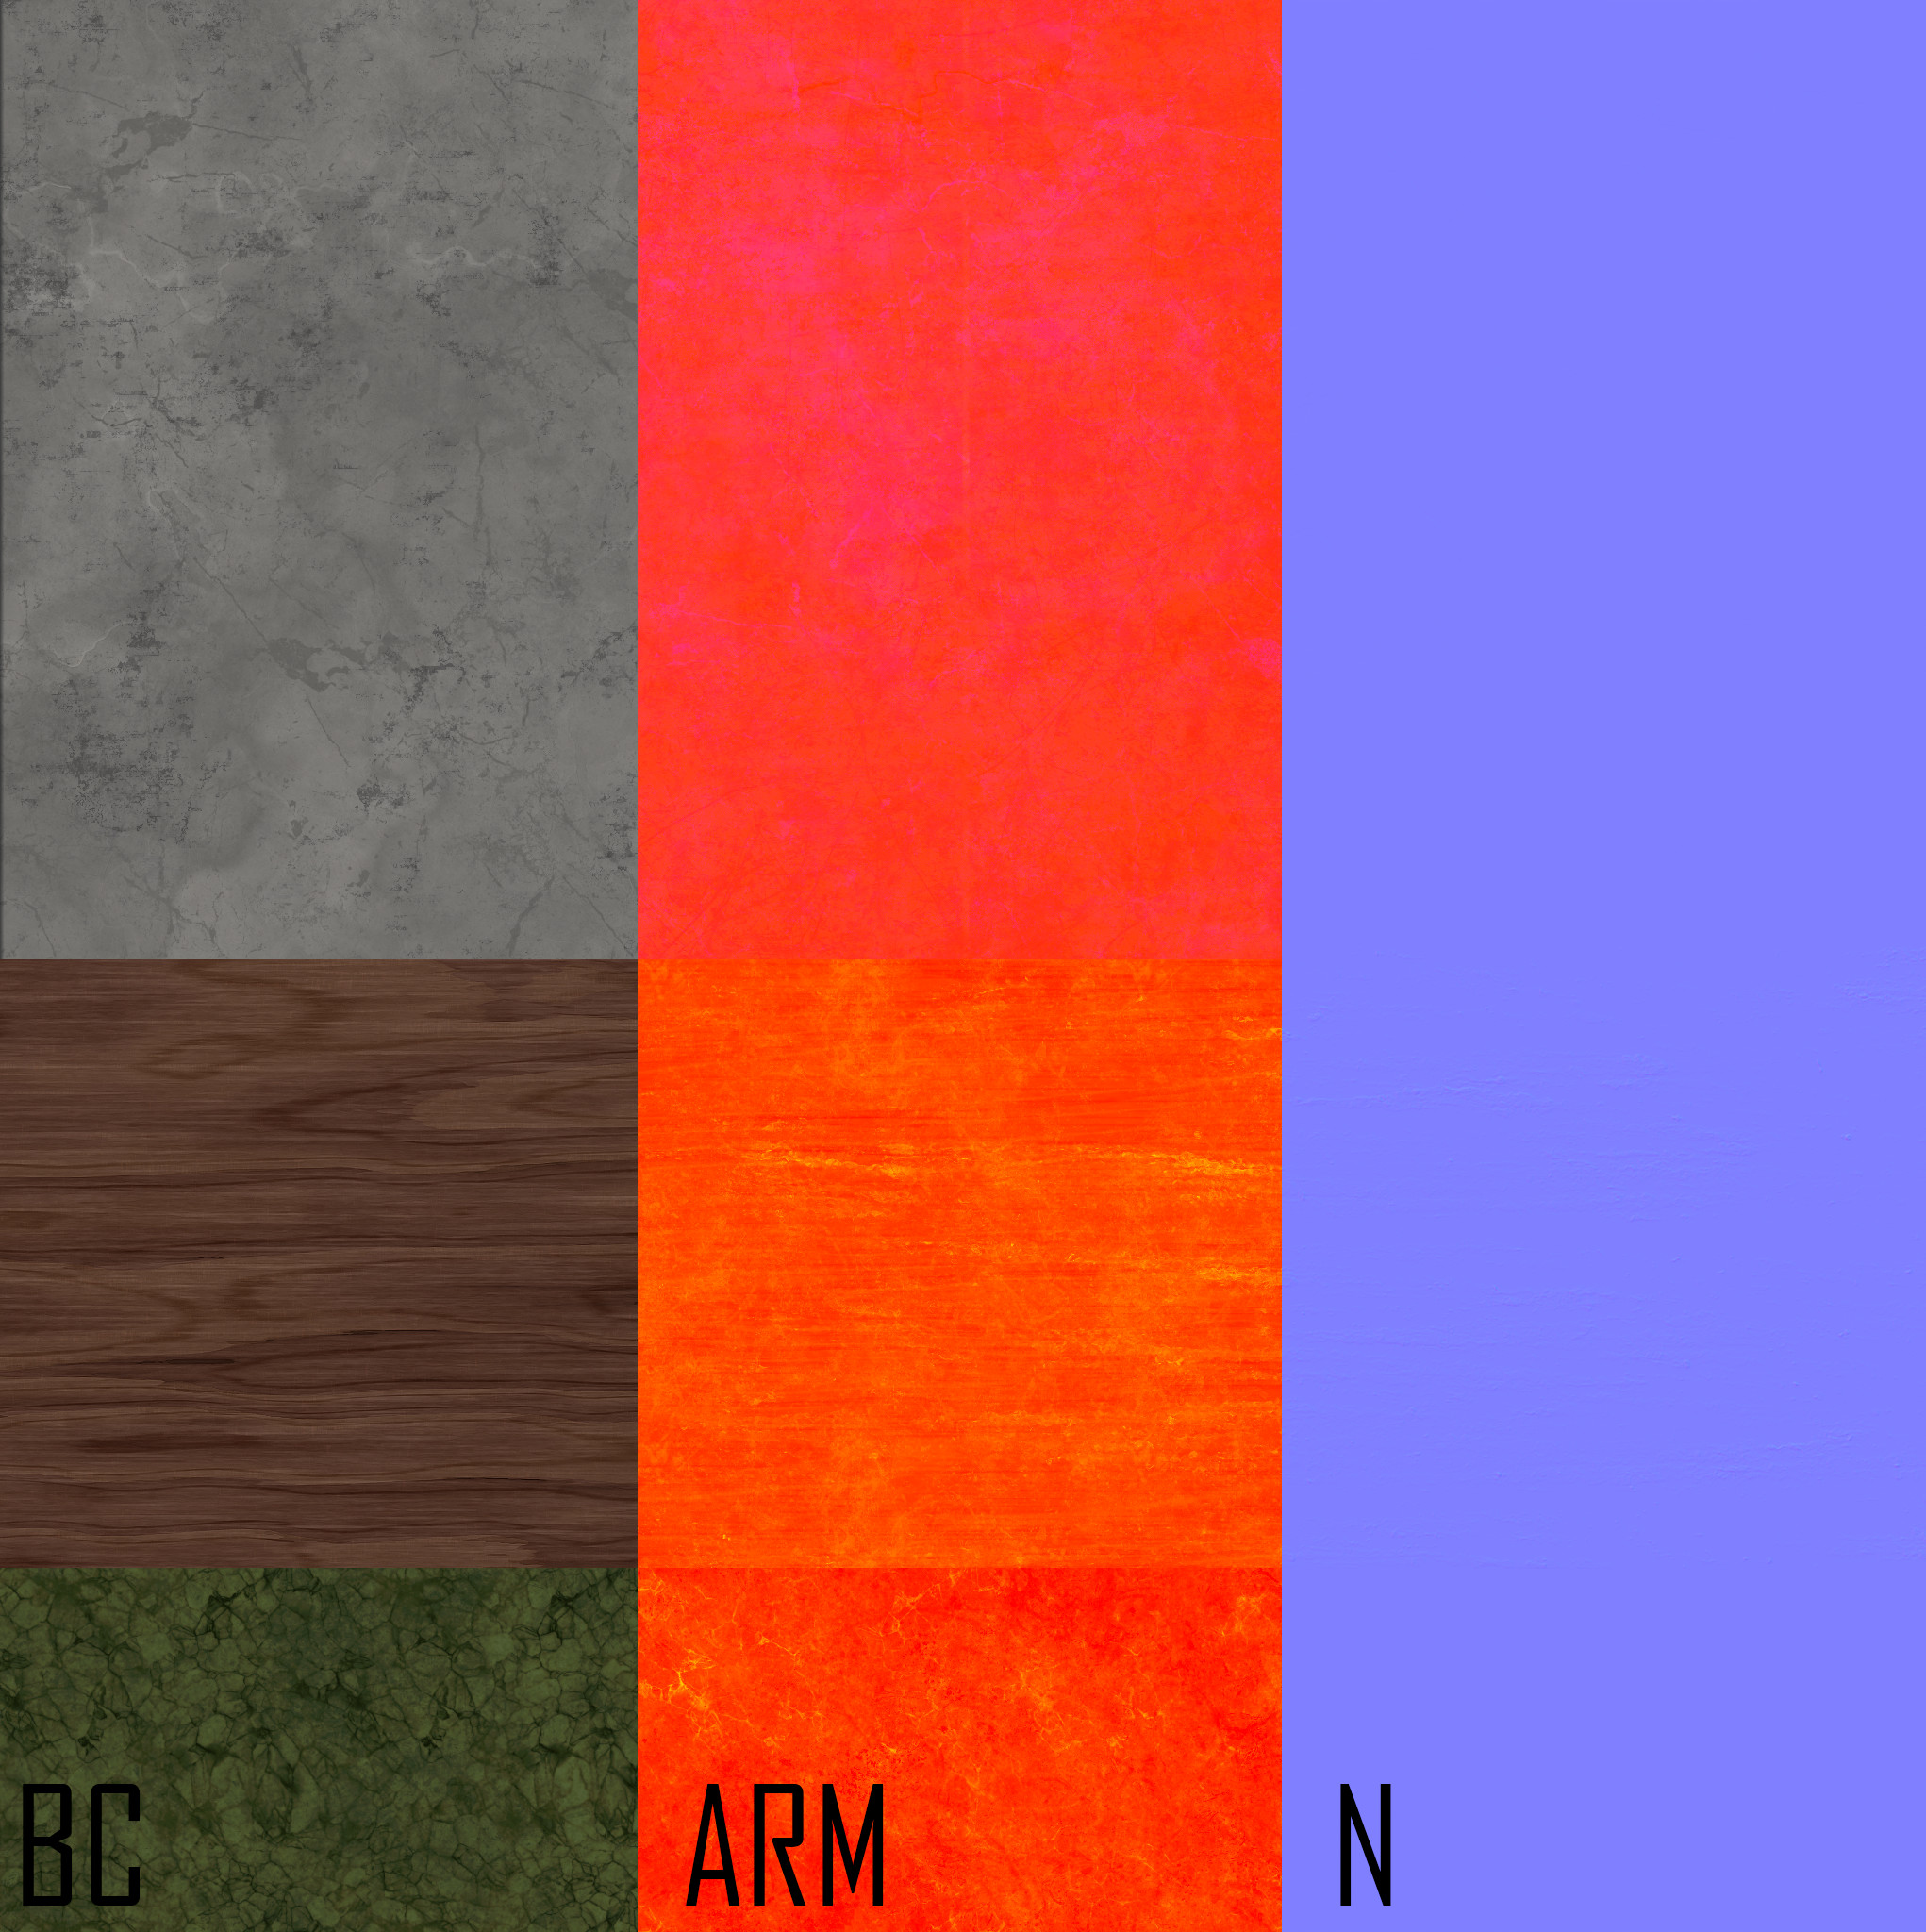 2048 x 2048